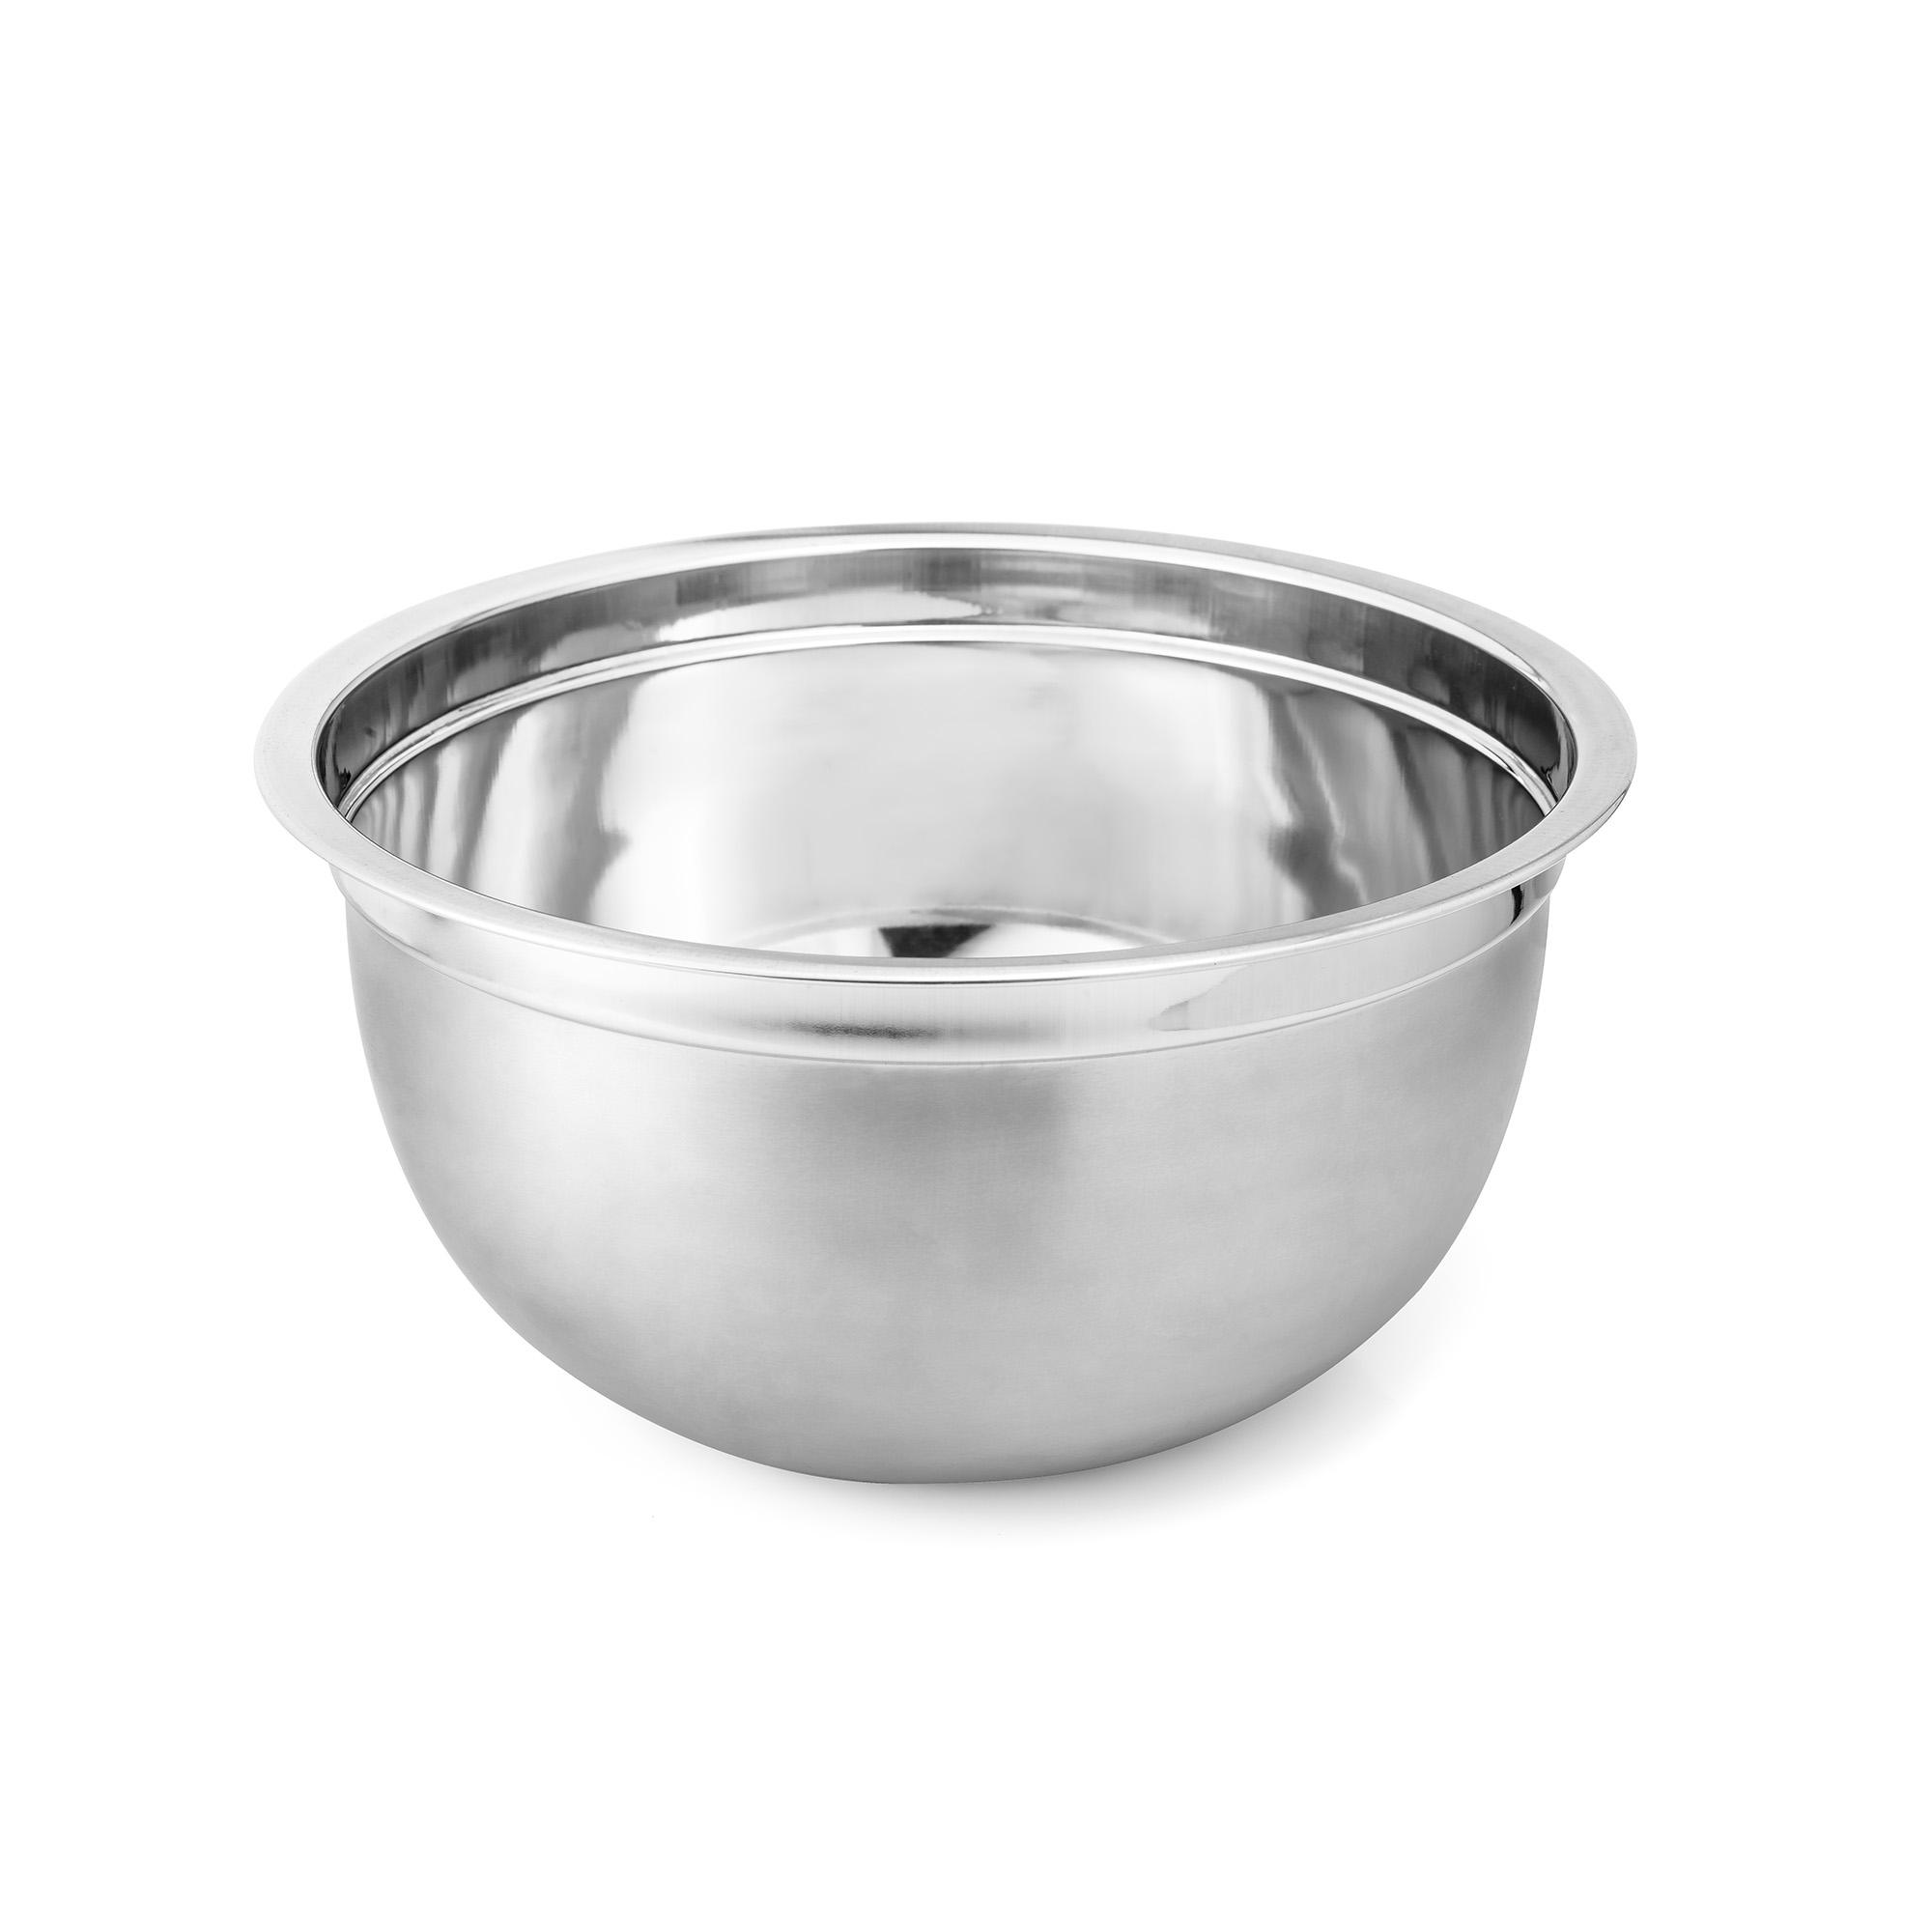 Bowl 7,5 Litros Inox Attuale